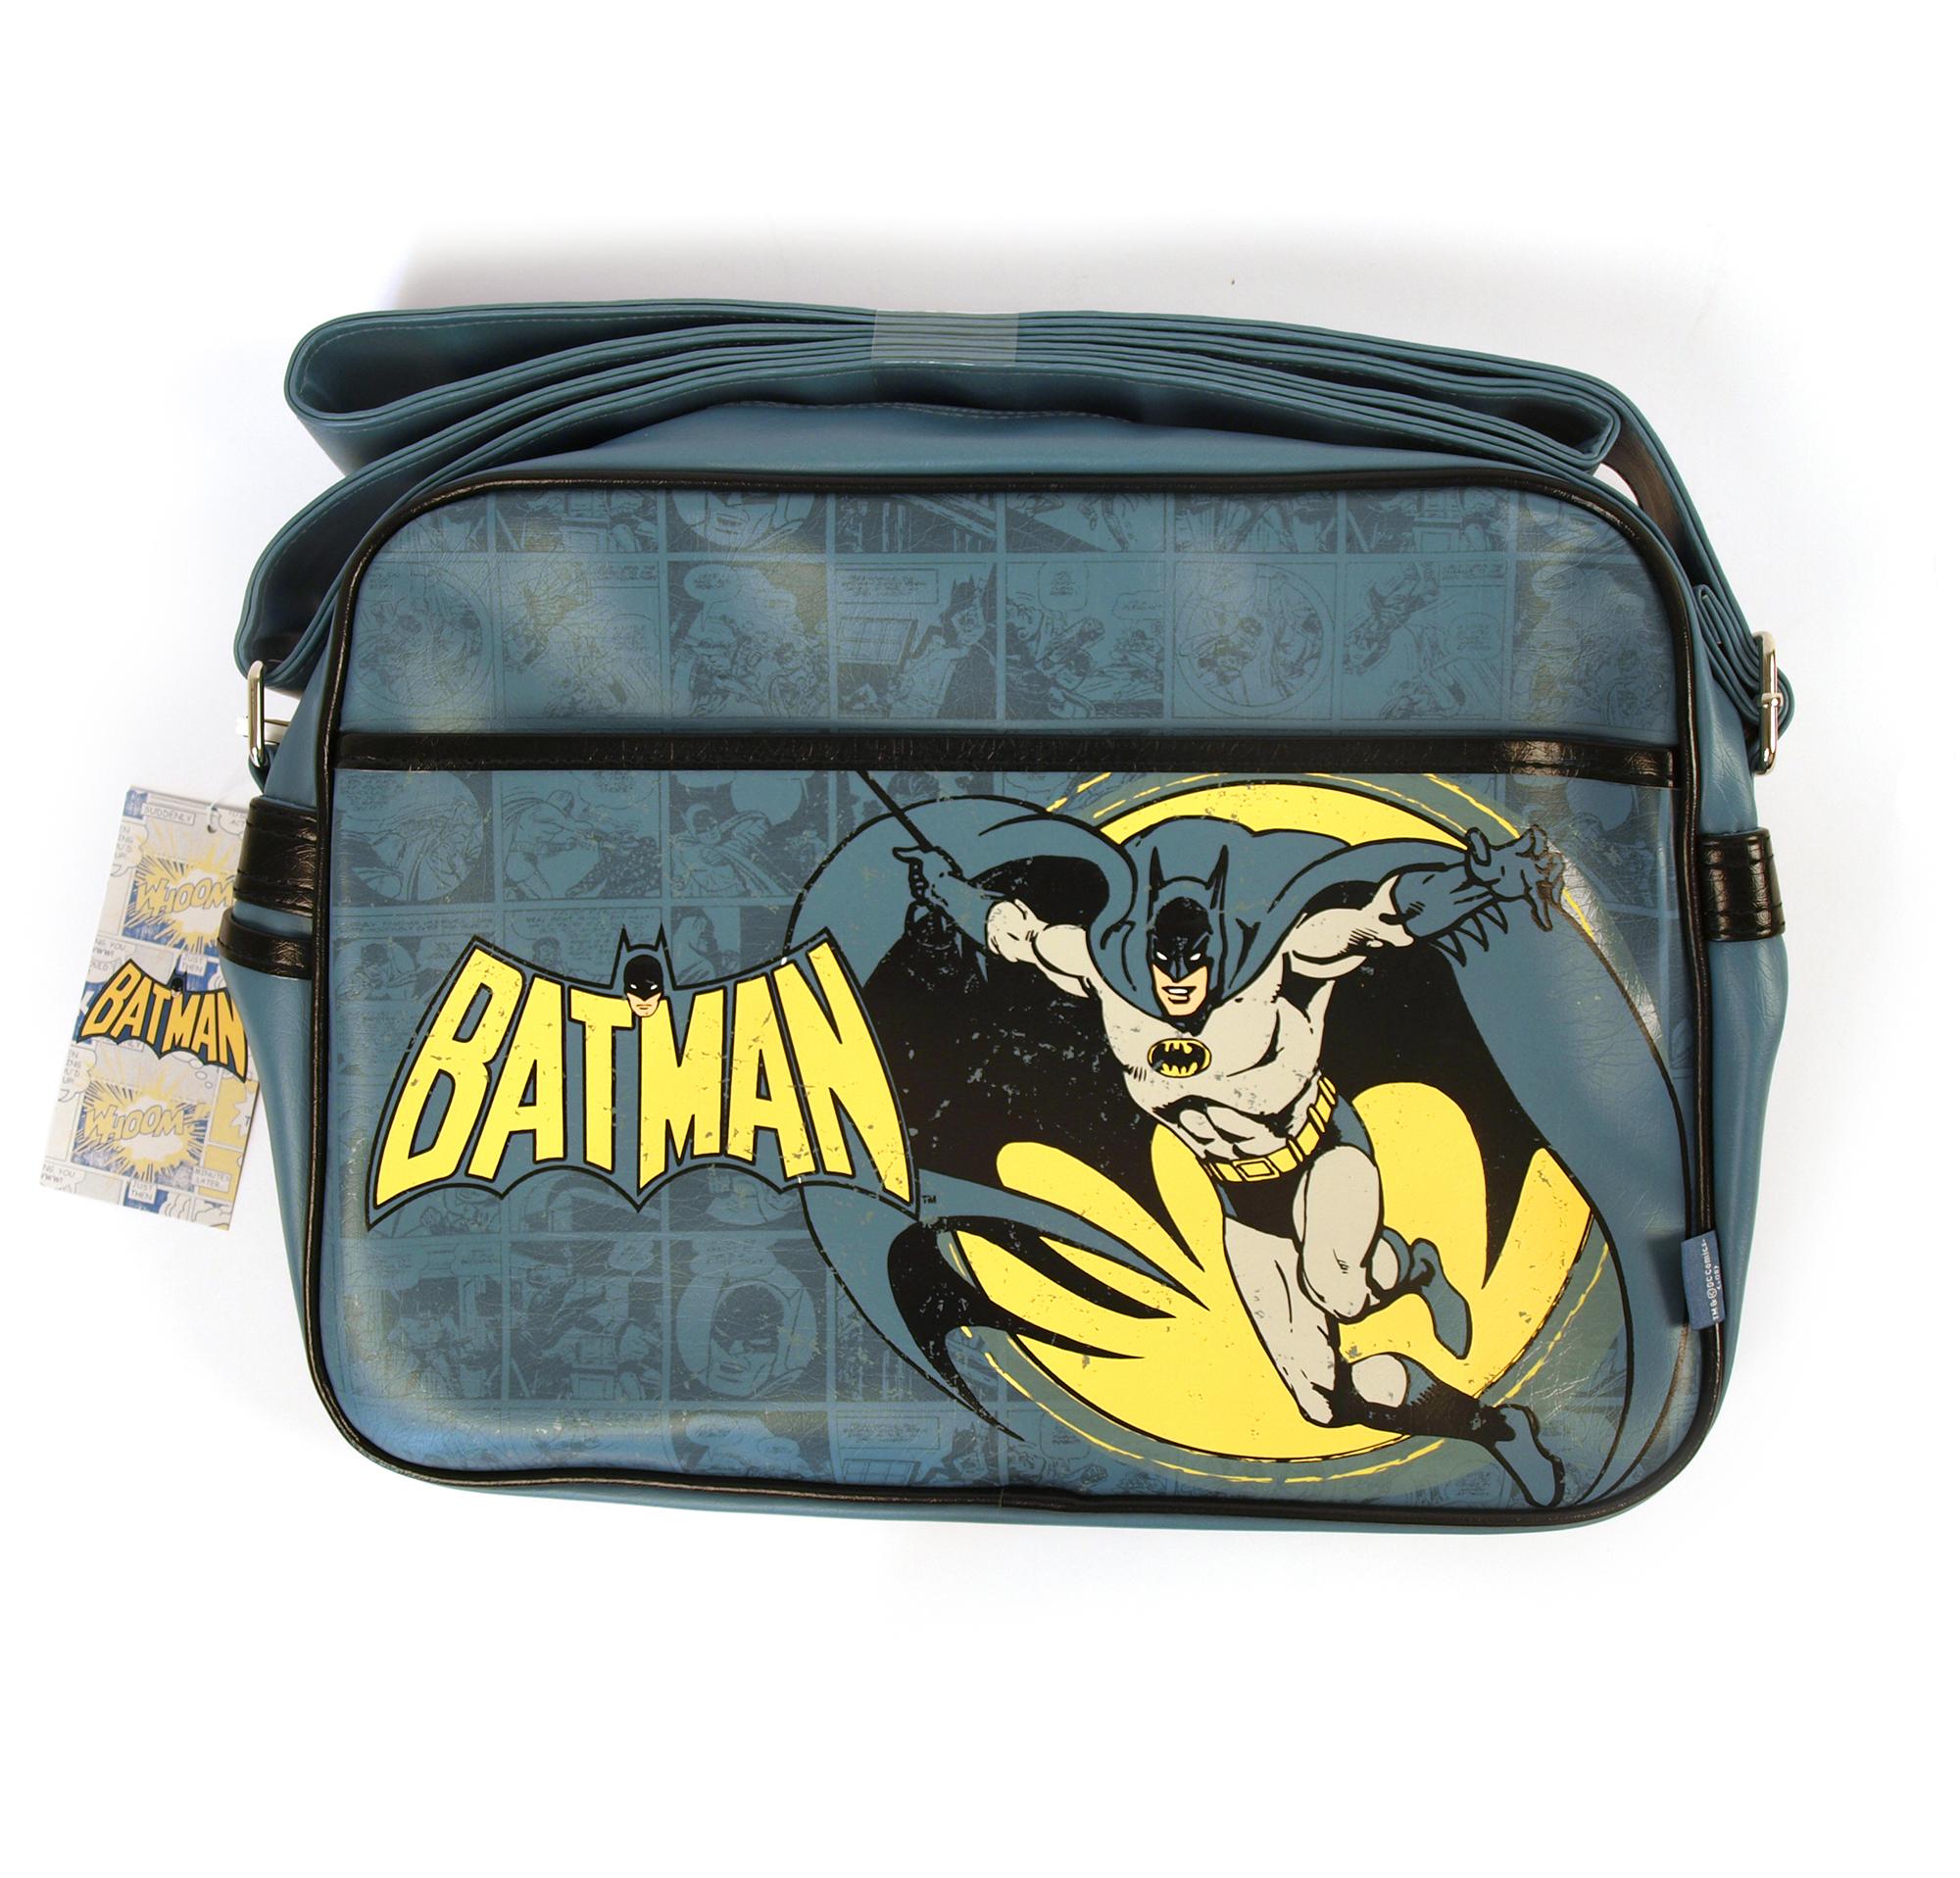 83d1fee00475 Batman Retro Style Shoulder   Sports Bag Thumbnail 1 ...